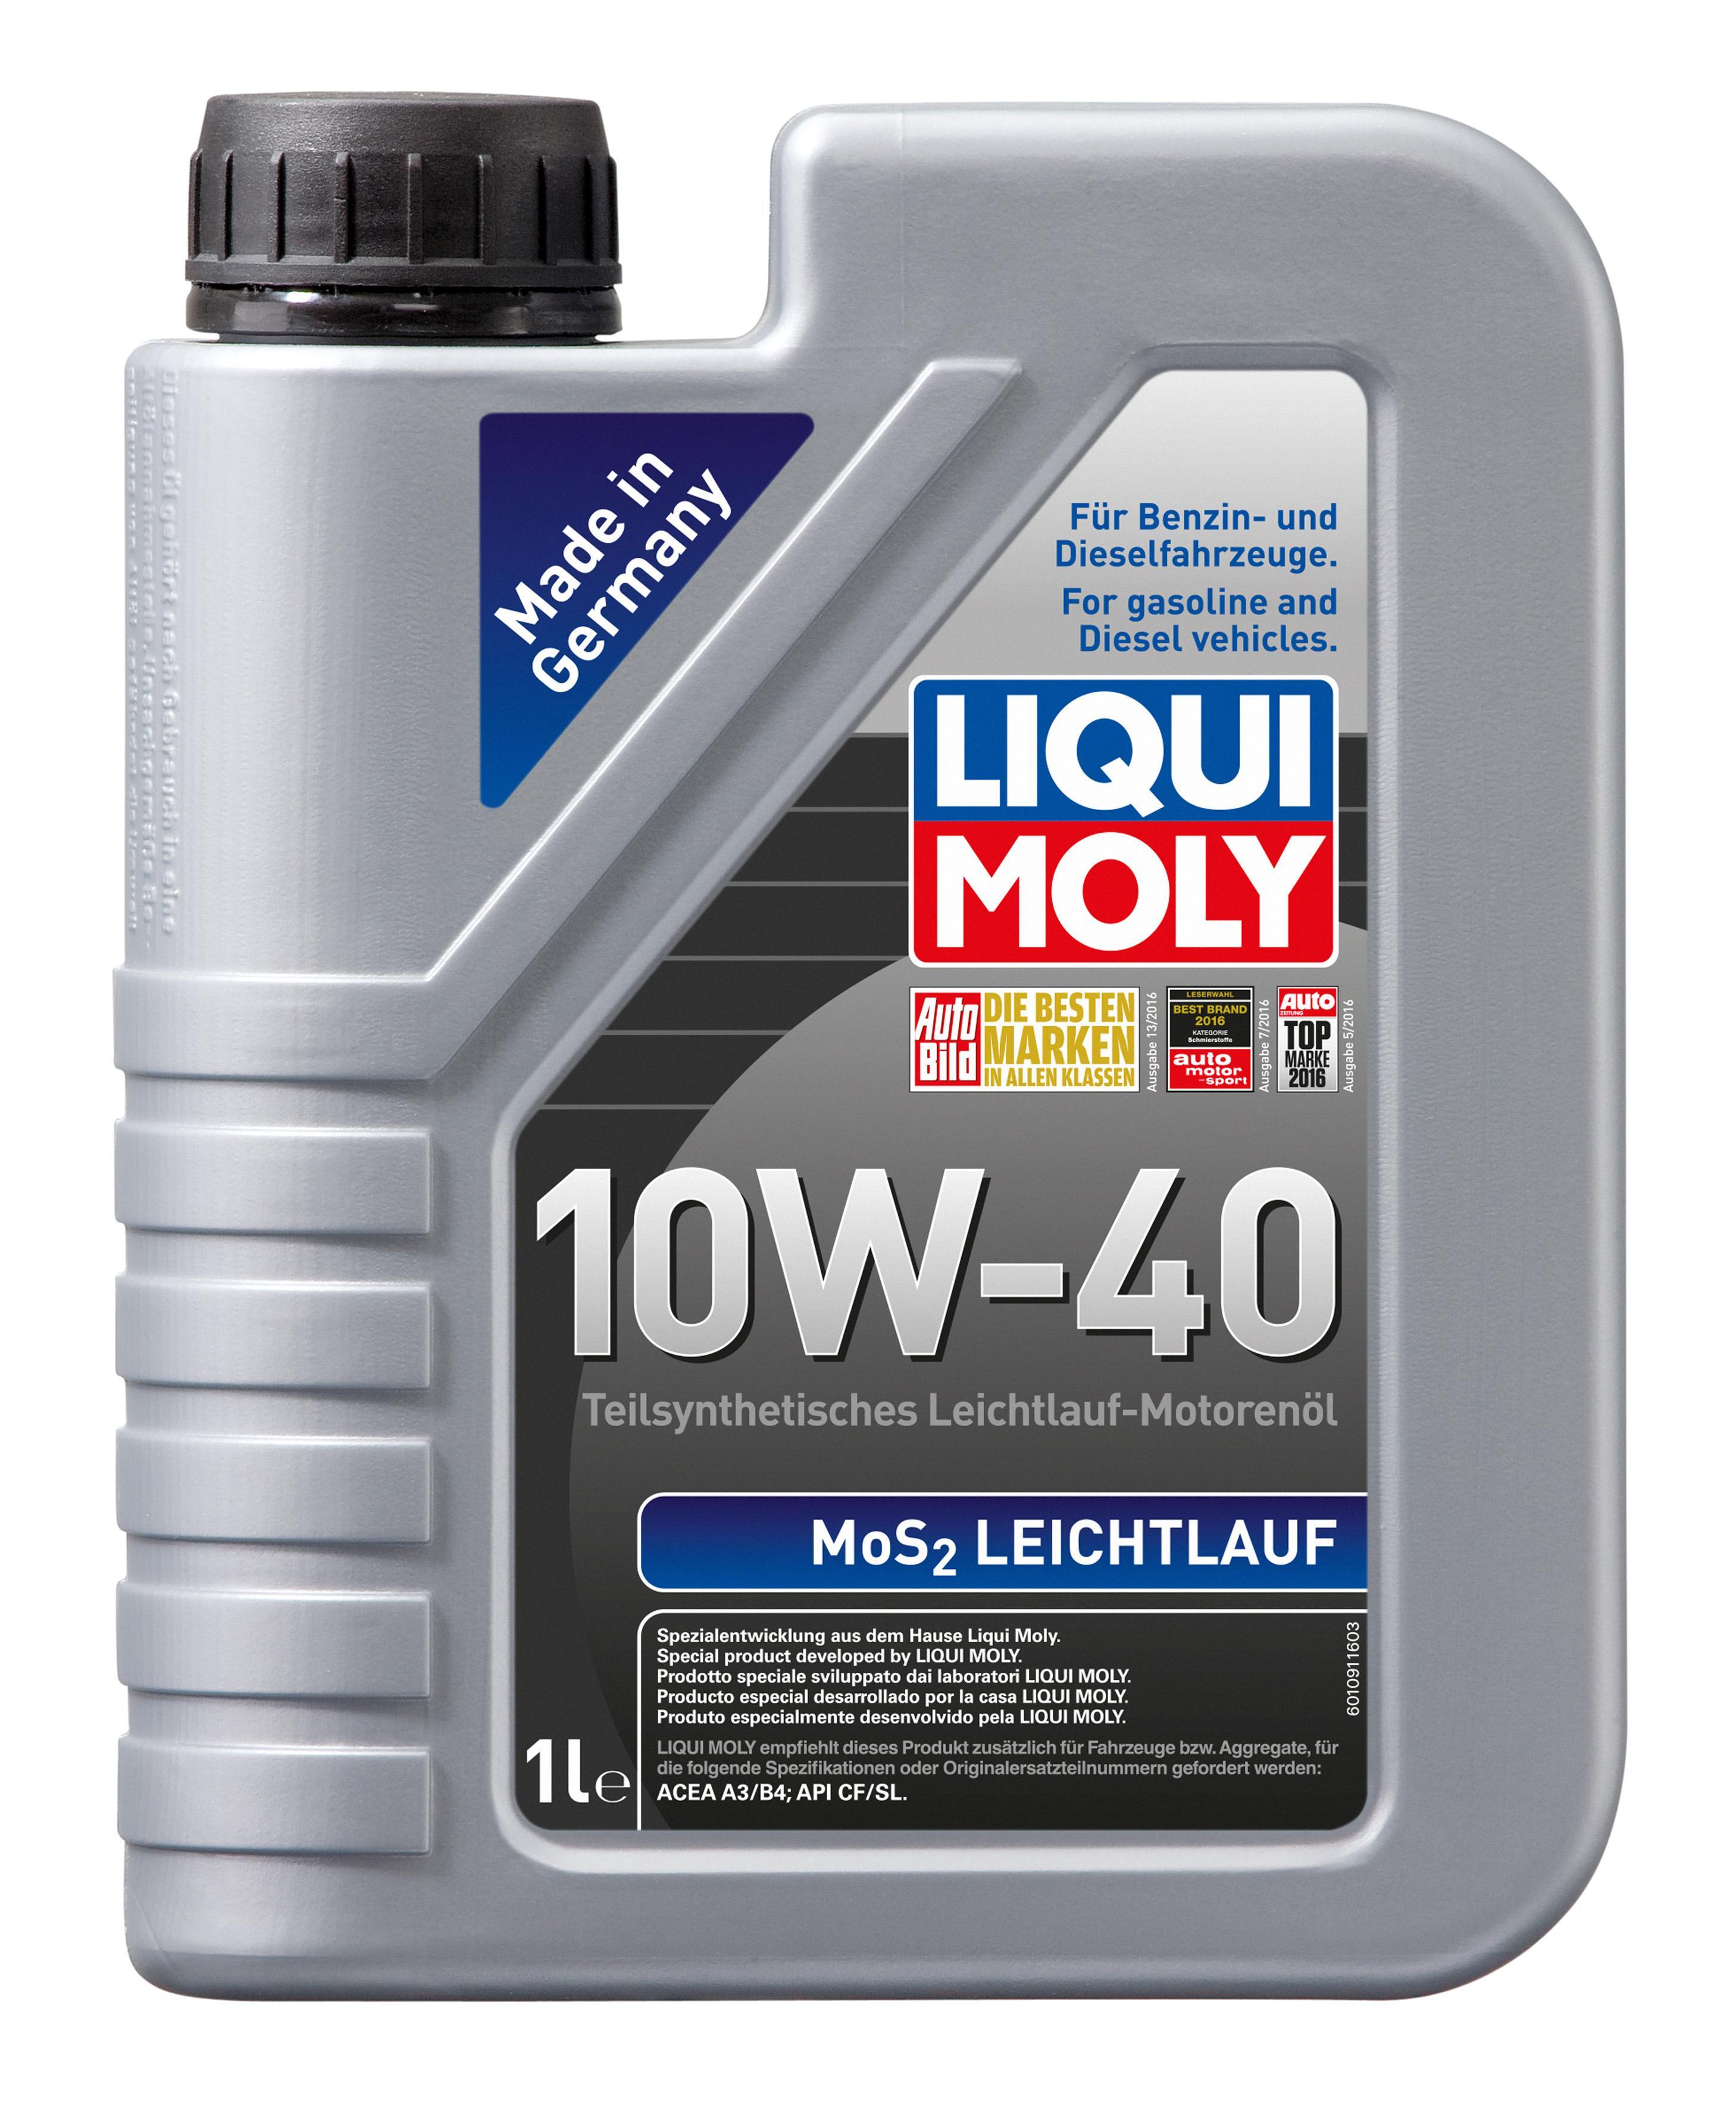 LIQUI MOLY МoS2, Leichtlauf Moottoriöljy 1091 - Osta nyt!